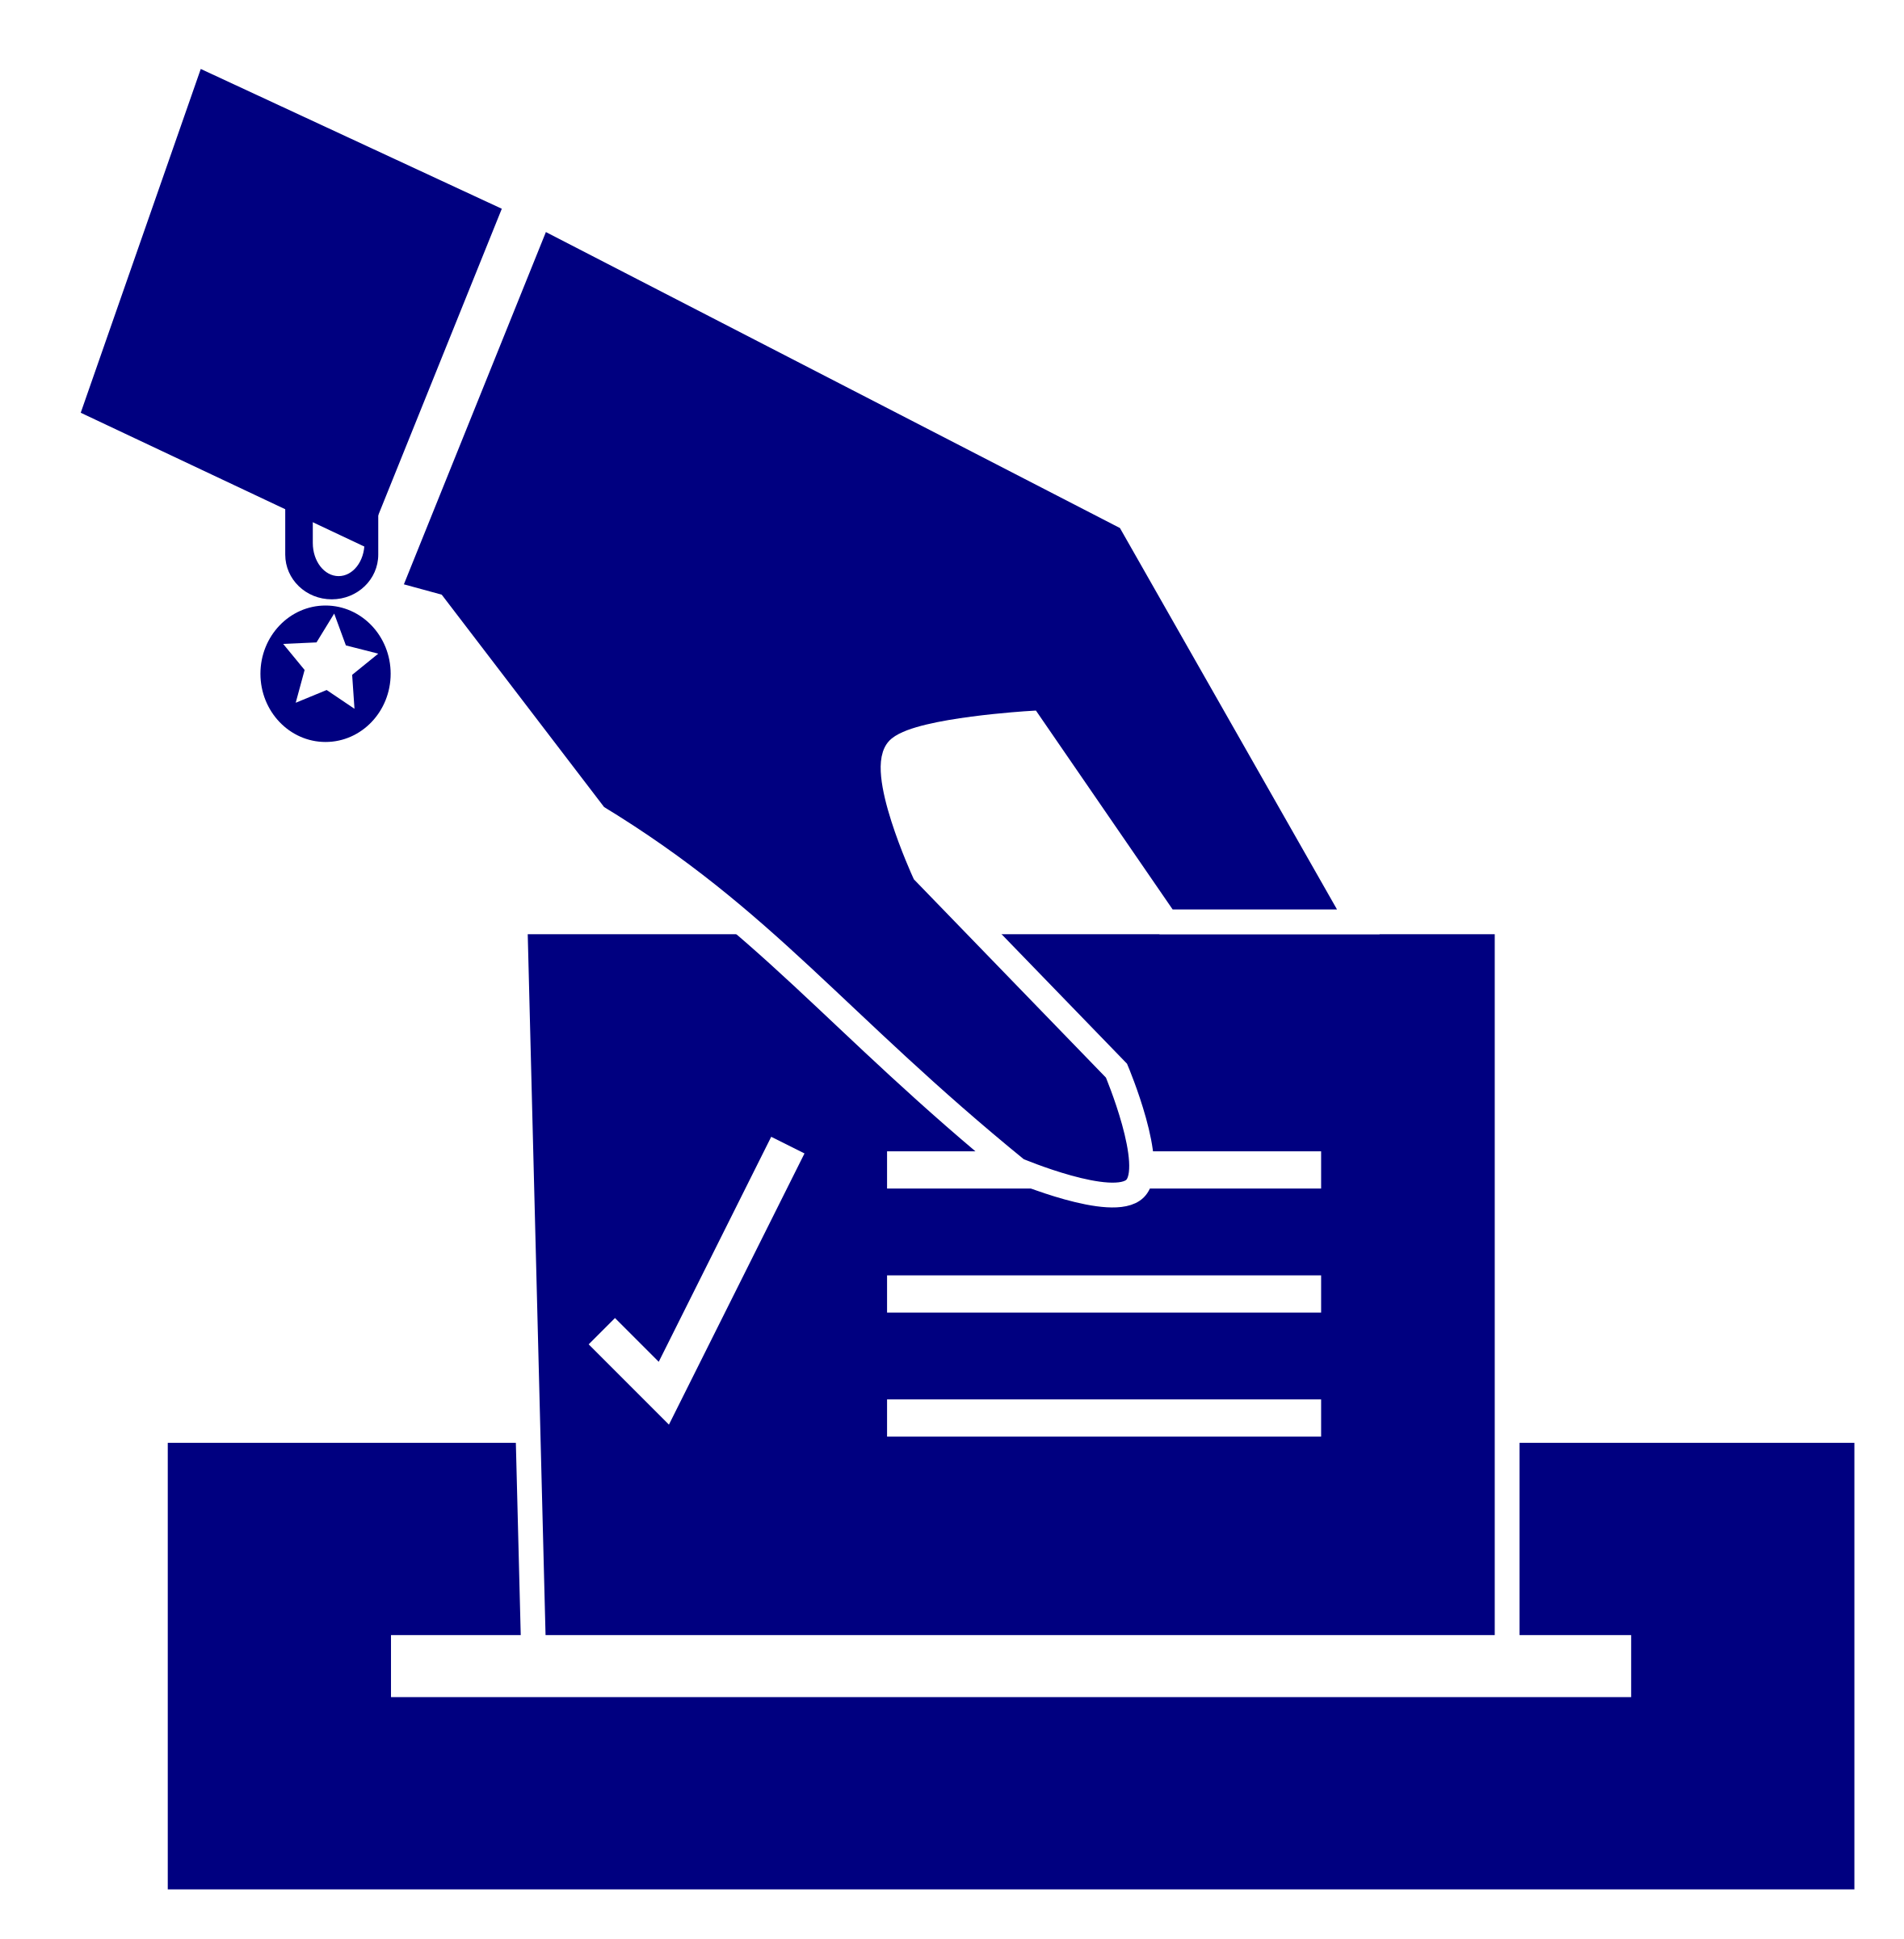 Ballot woman s big. Election clipart hand